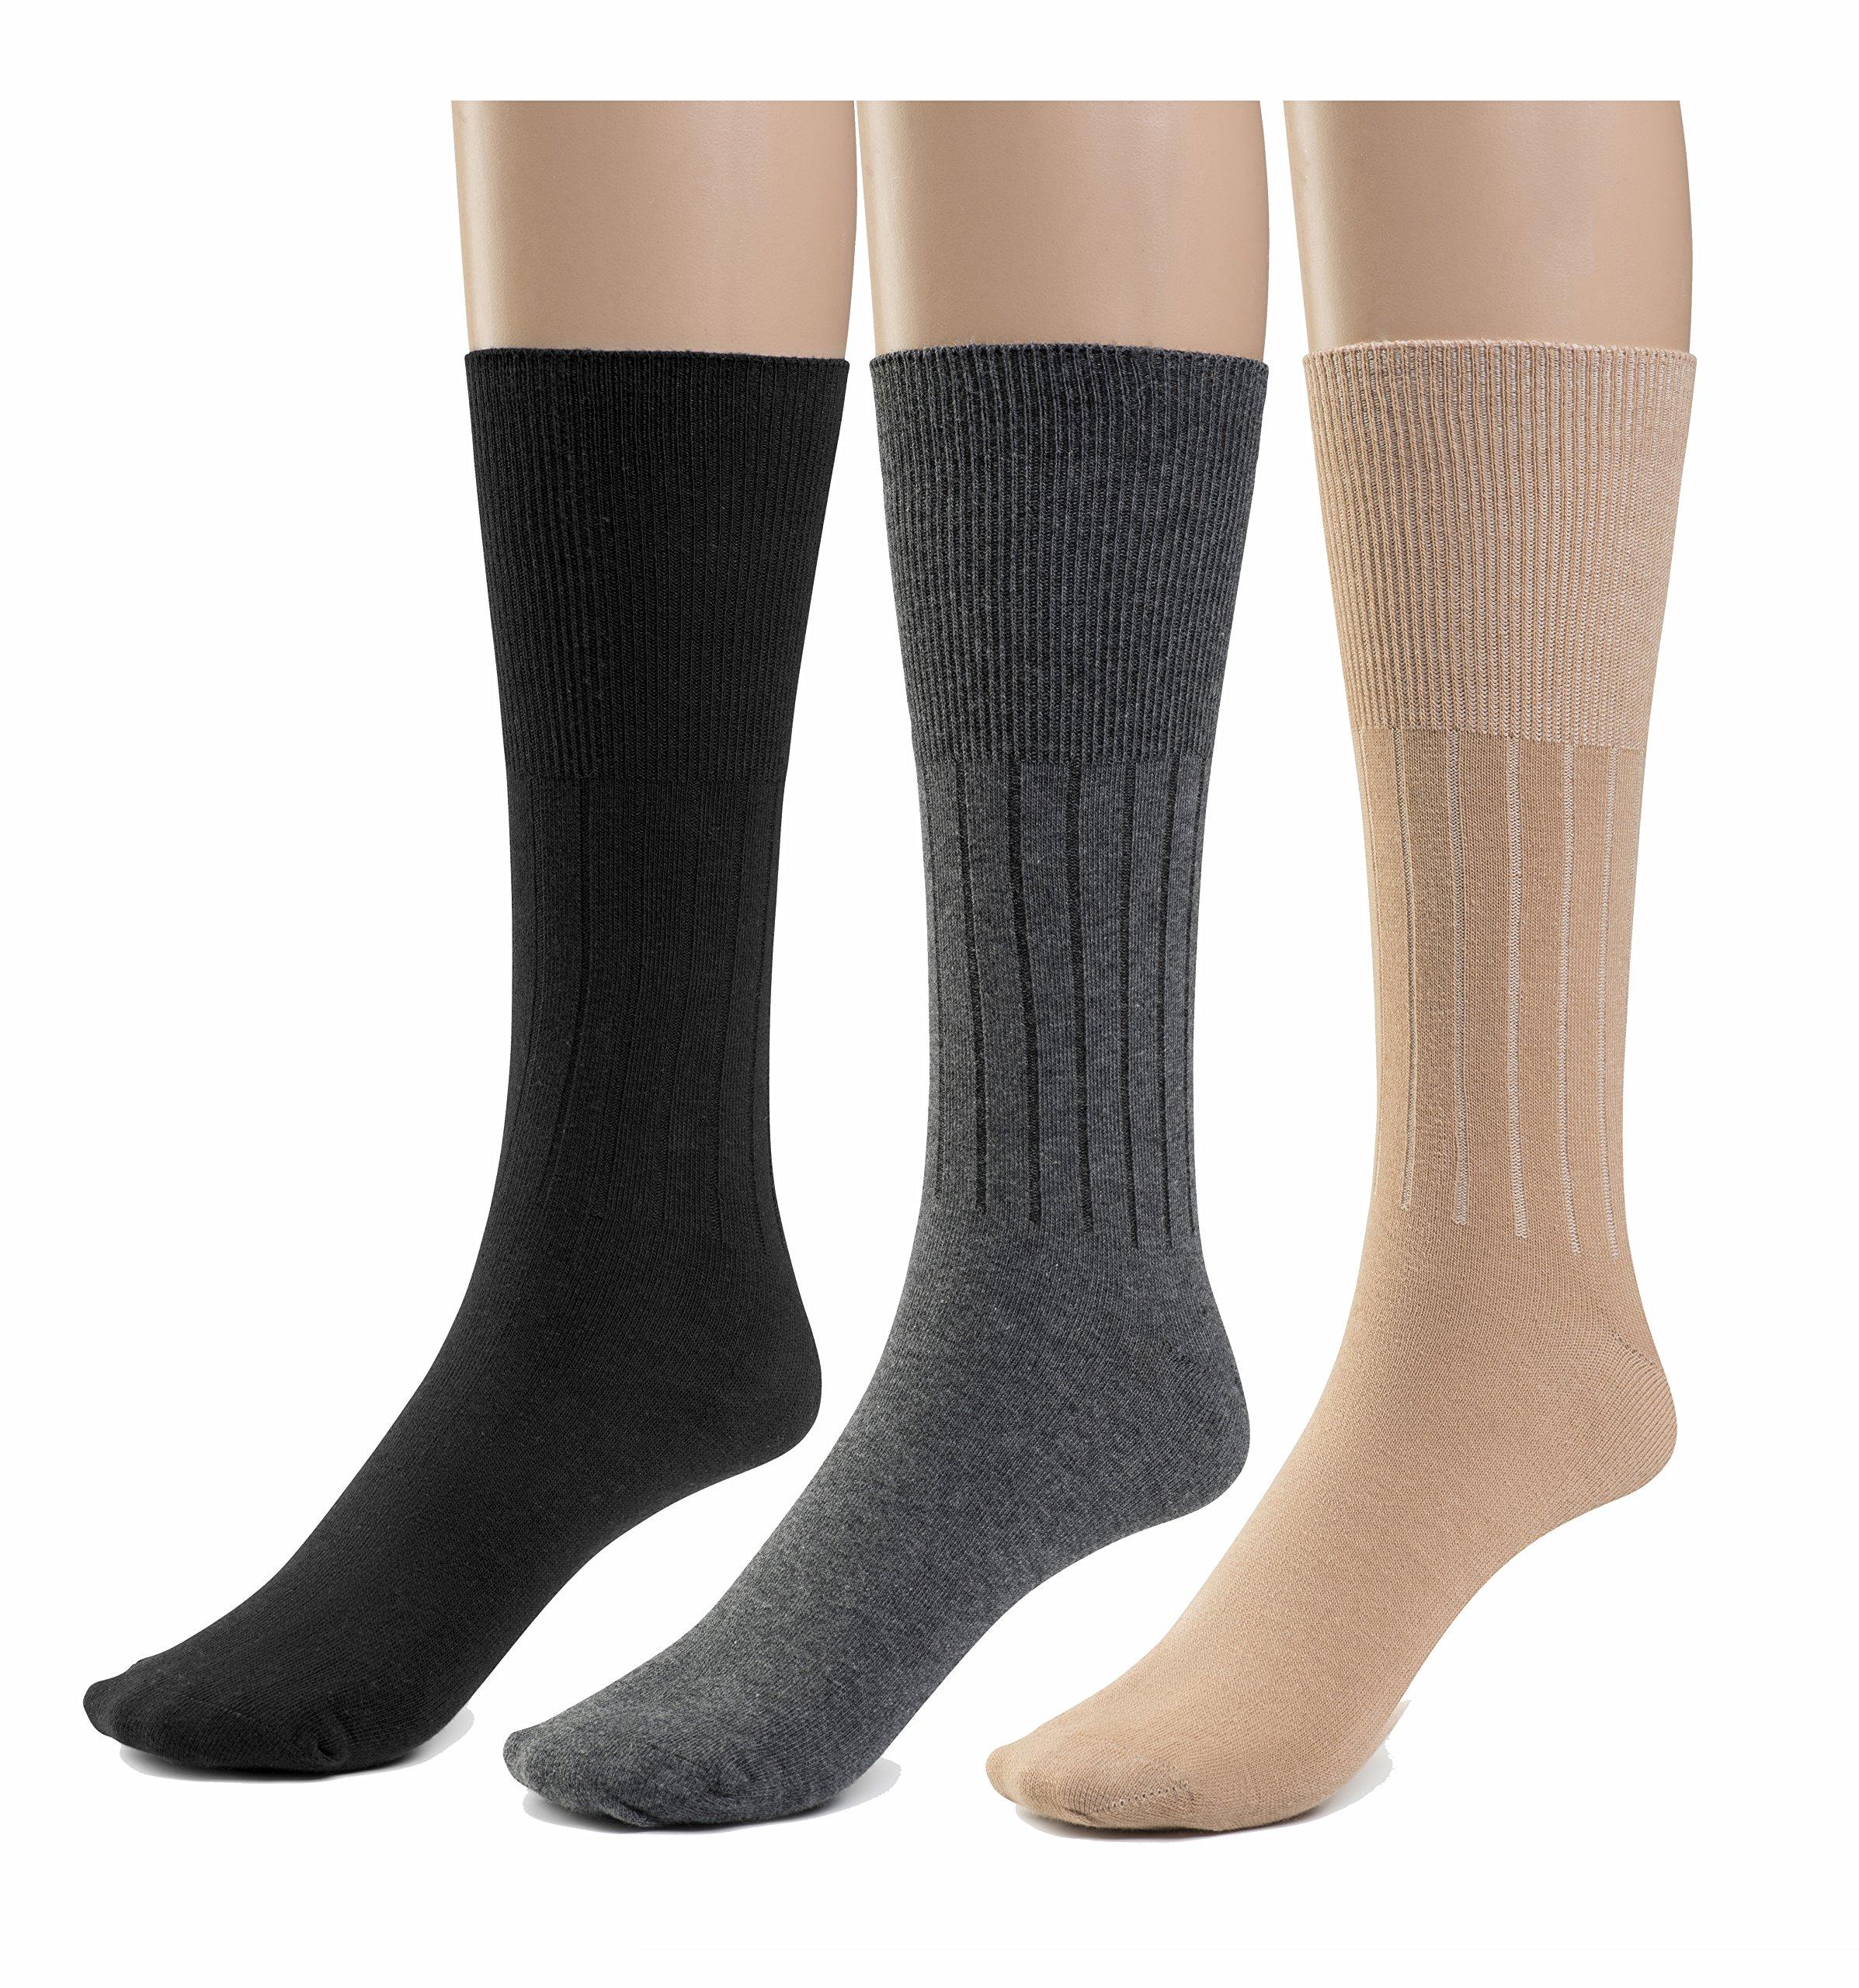 Silky Toes Women's Diabetic 3Pk Premium Soft Non-Binding Cotton Dress Socks (2X, Black/Grey/ Tan -3 Pairs)